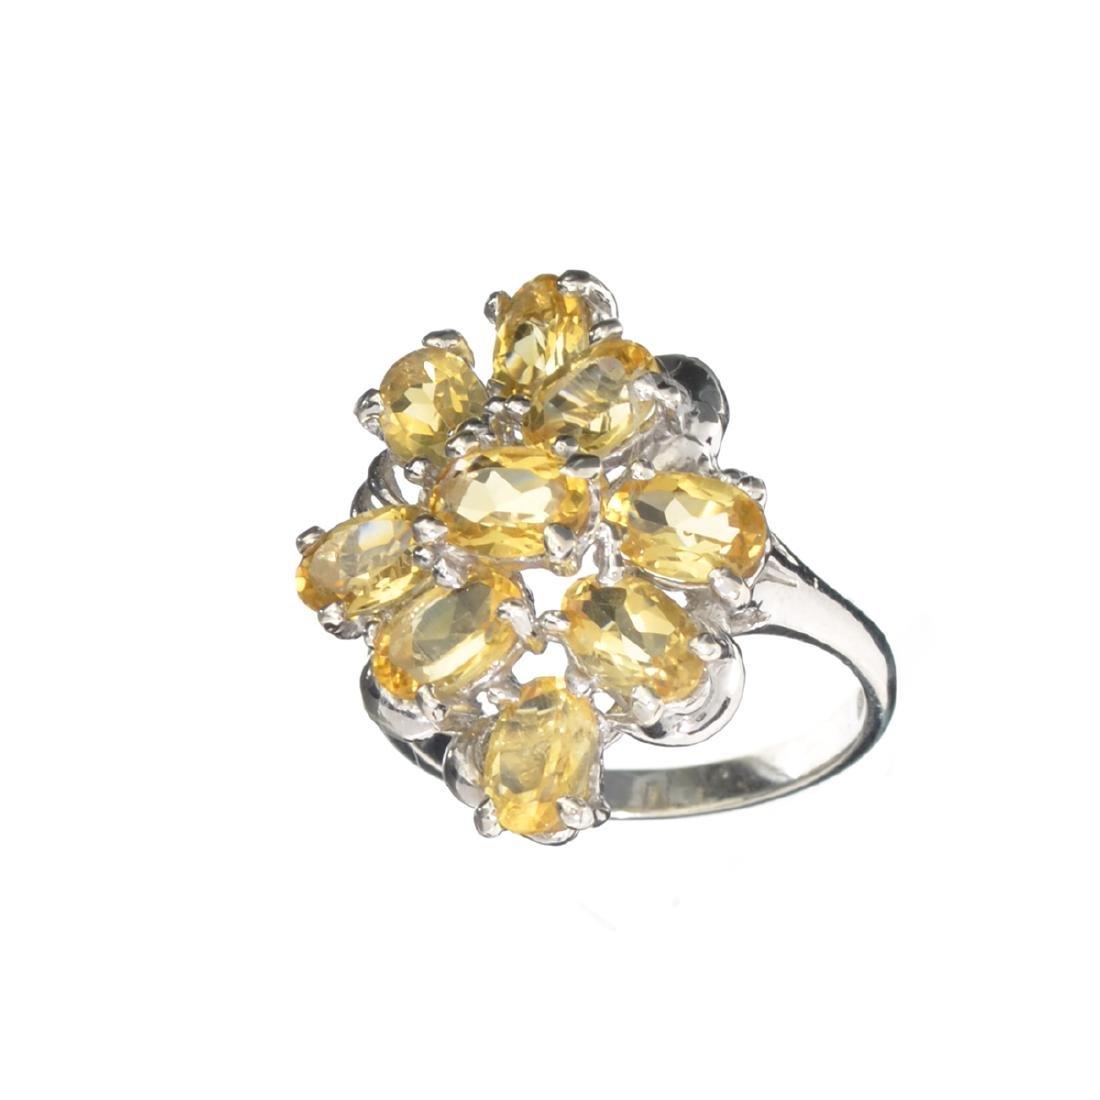 APP: 0.5k Fine Jewelry Designer Sebastian, 3.25CT Oval